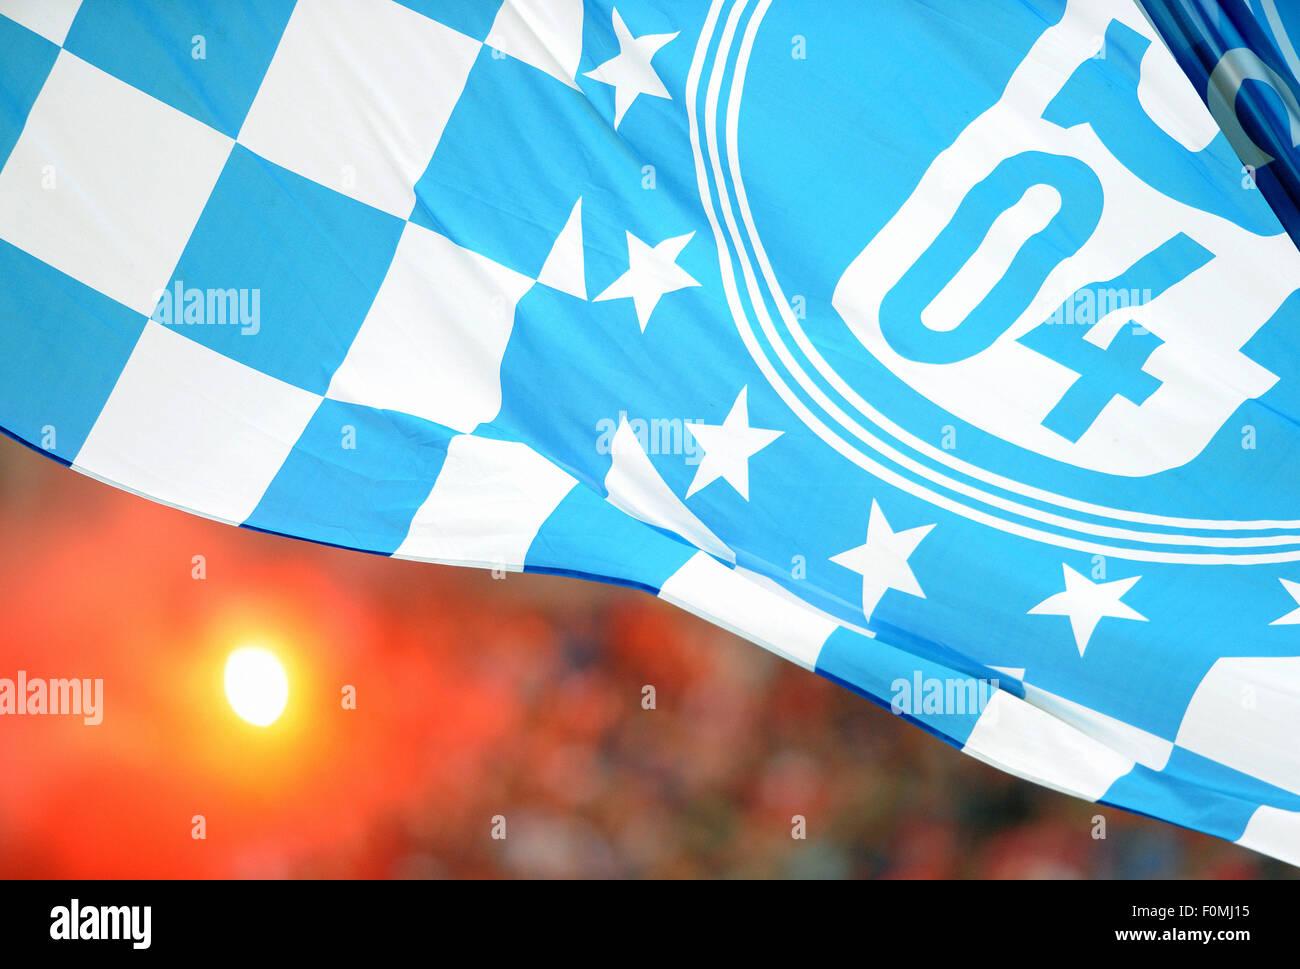 Football, Soccer, Germany, Bundesliga, Season 2015/2016, Veltins Arena; FC Schalke 04: blue and white supporters - Stock Image